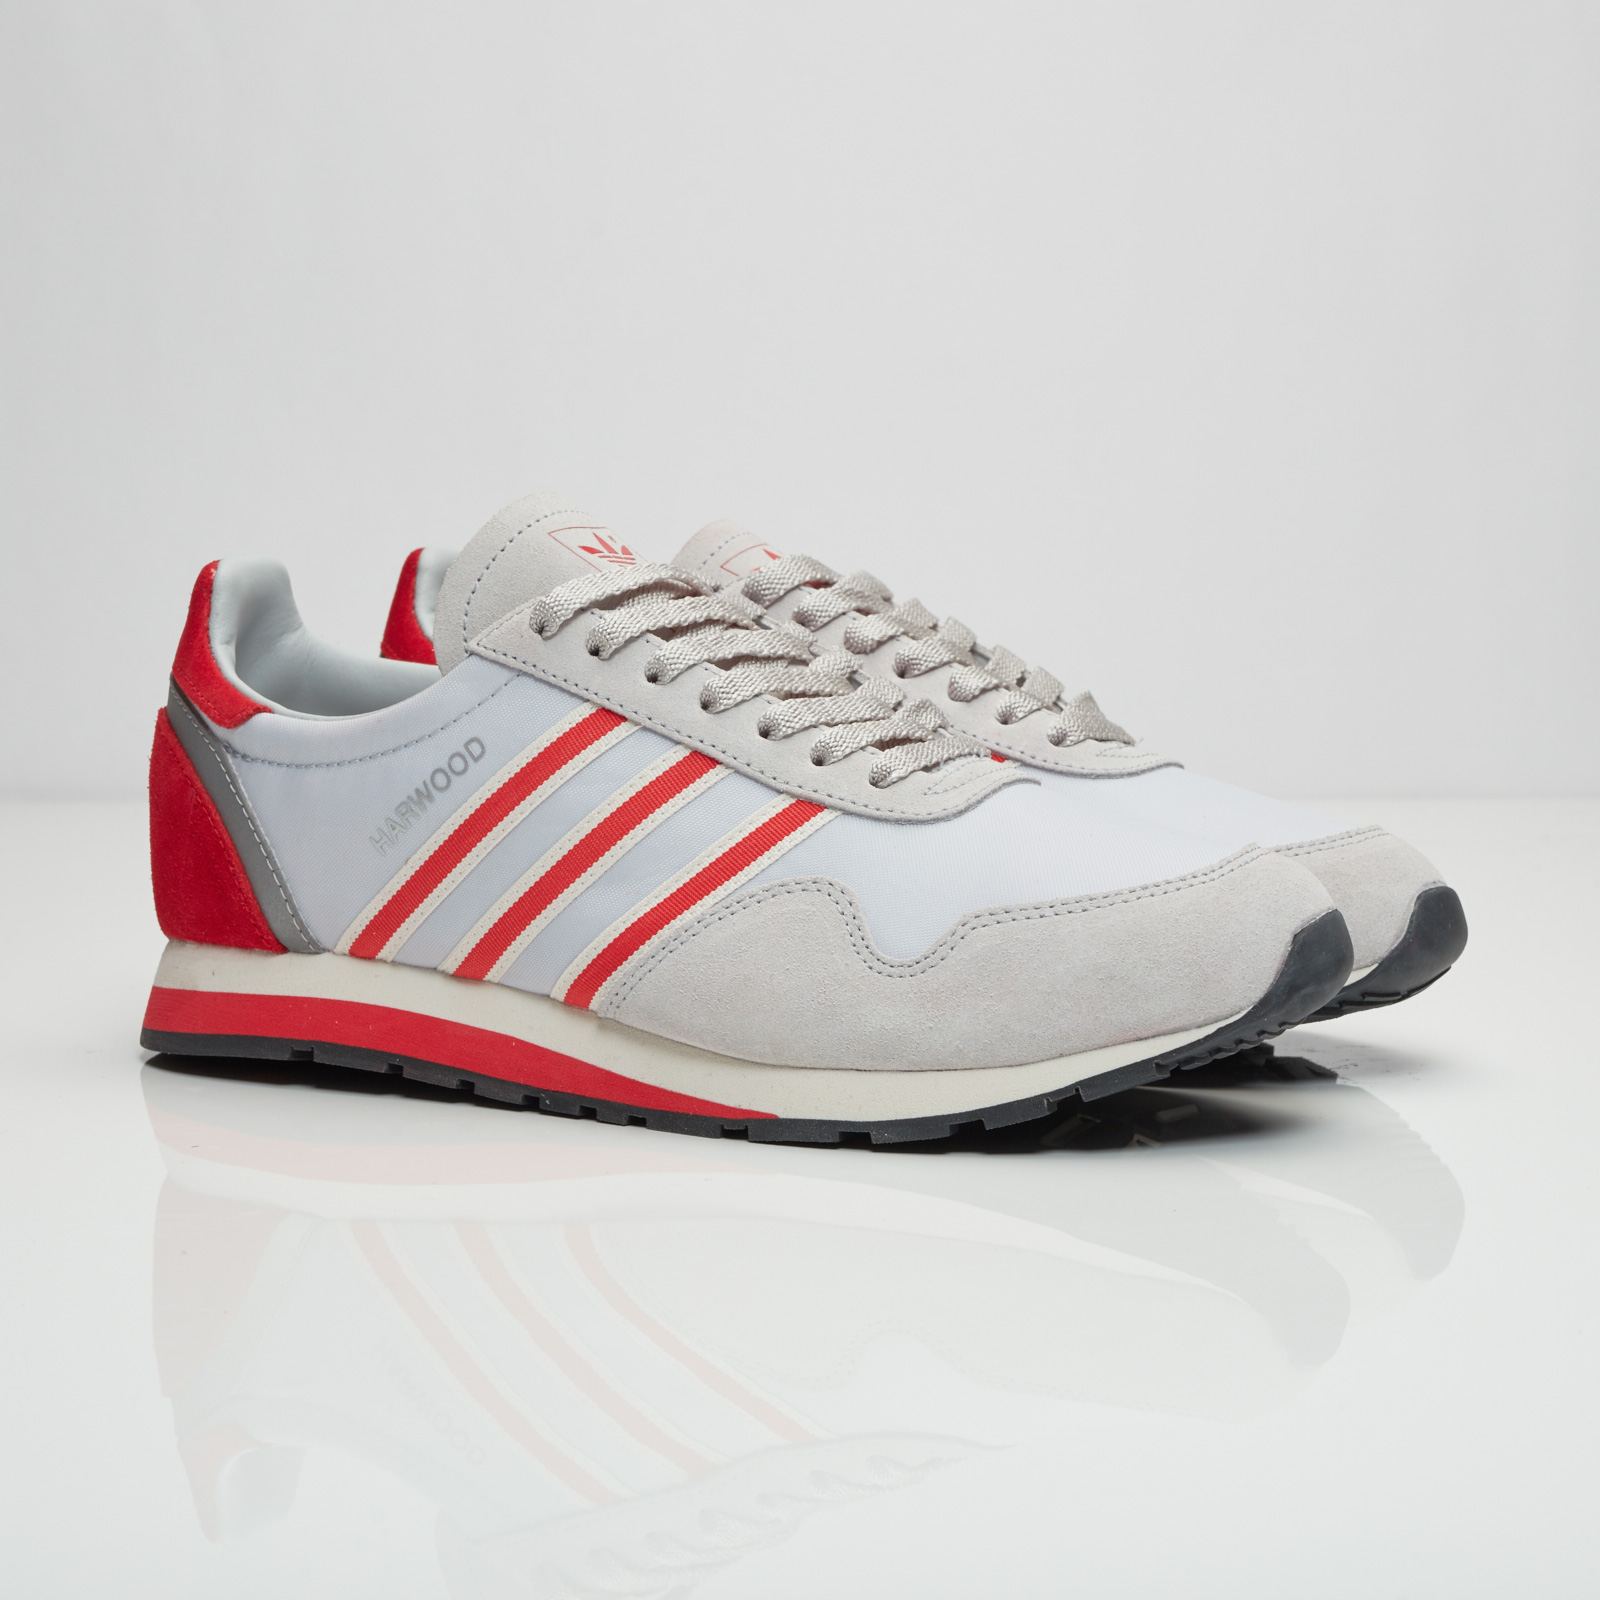 adidas harwood spzl s76516 sneakersnstuff turnschuhe